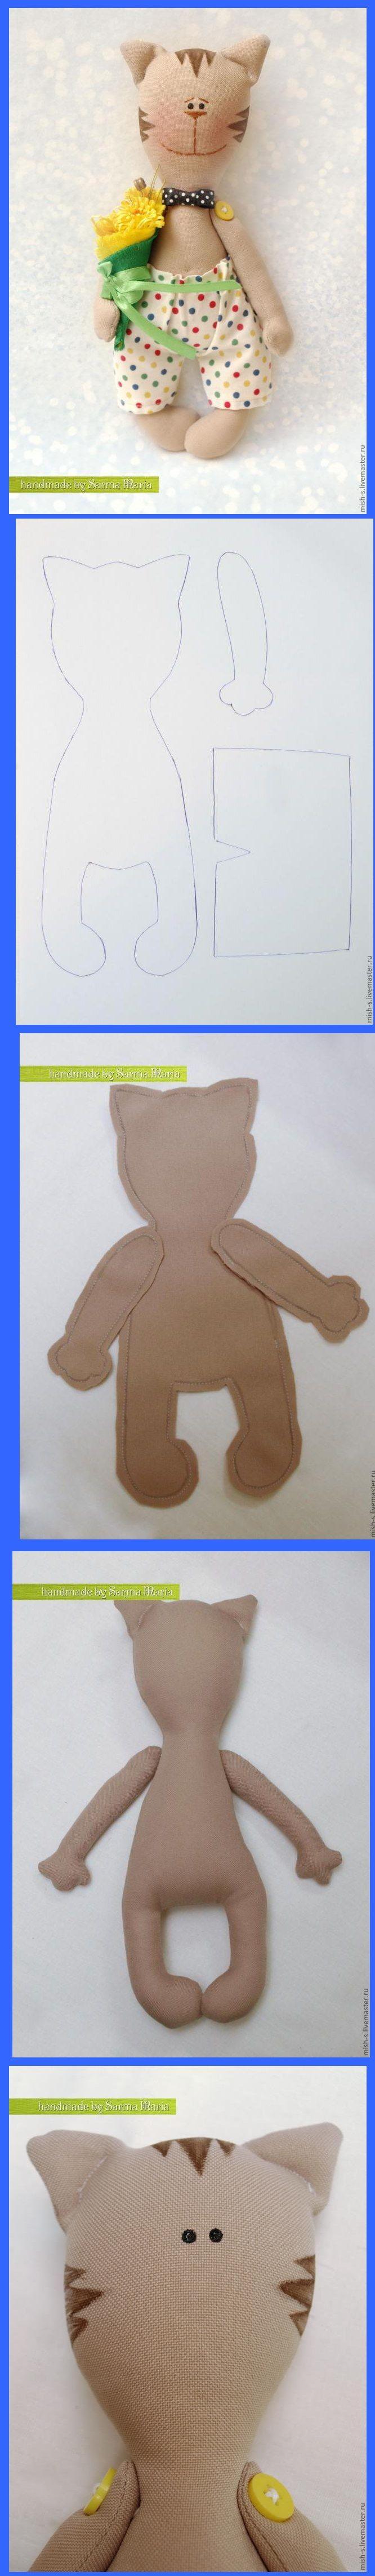 soft stuffed toy kitty cat doll pattern